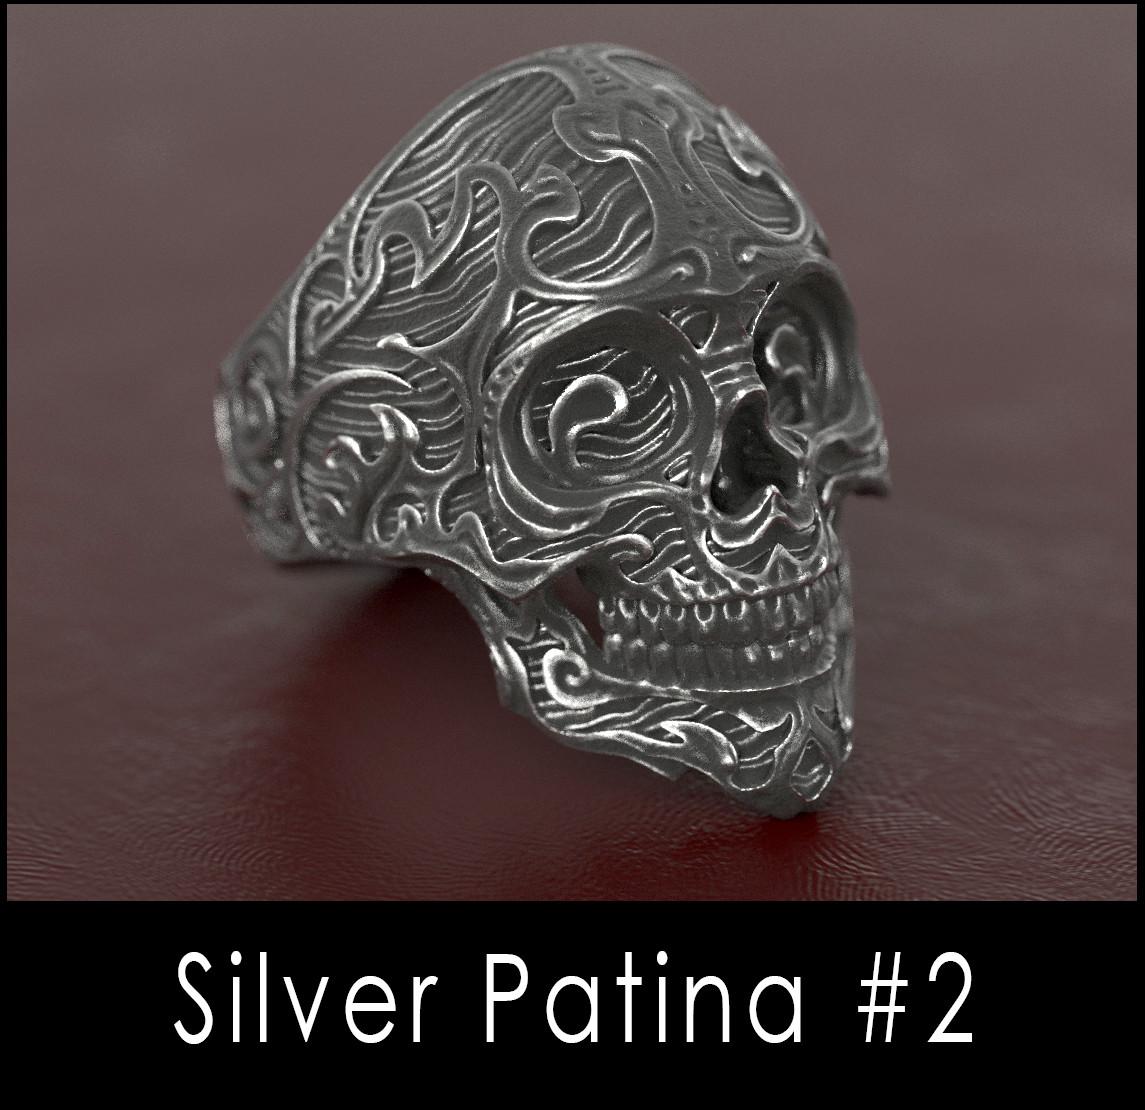 Nacho riesco gostanza silver patina n2